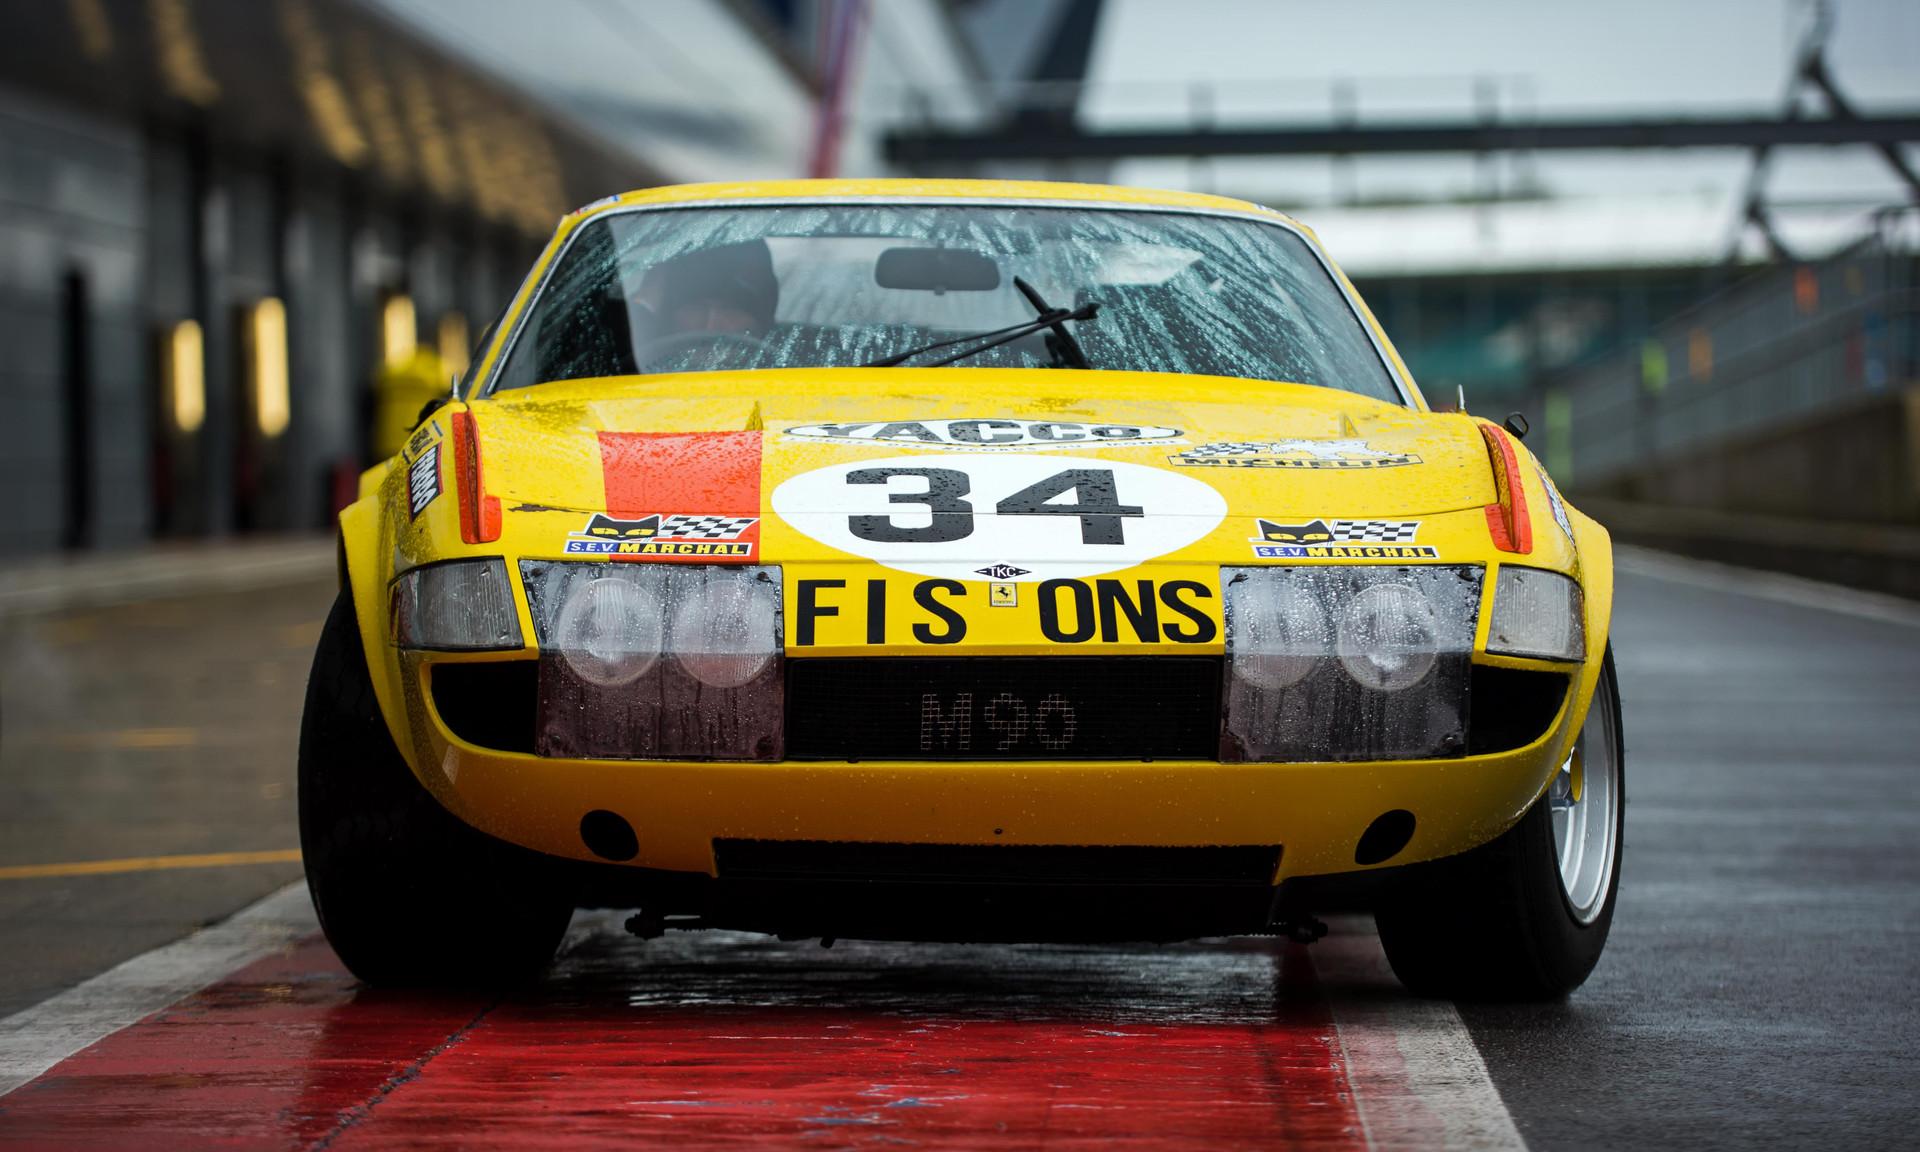 1972 Ferrari 365 GTB 4 Daytona at the 2018 Silverstone Classic Preview Day